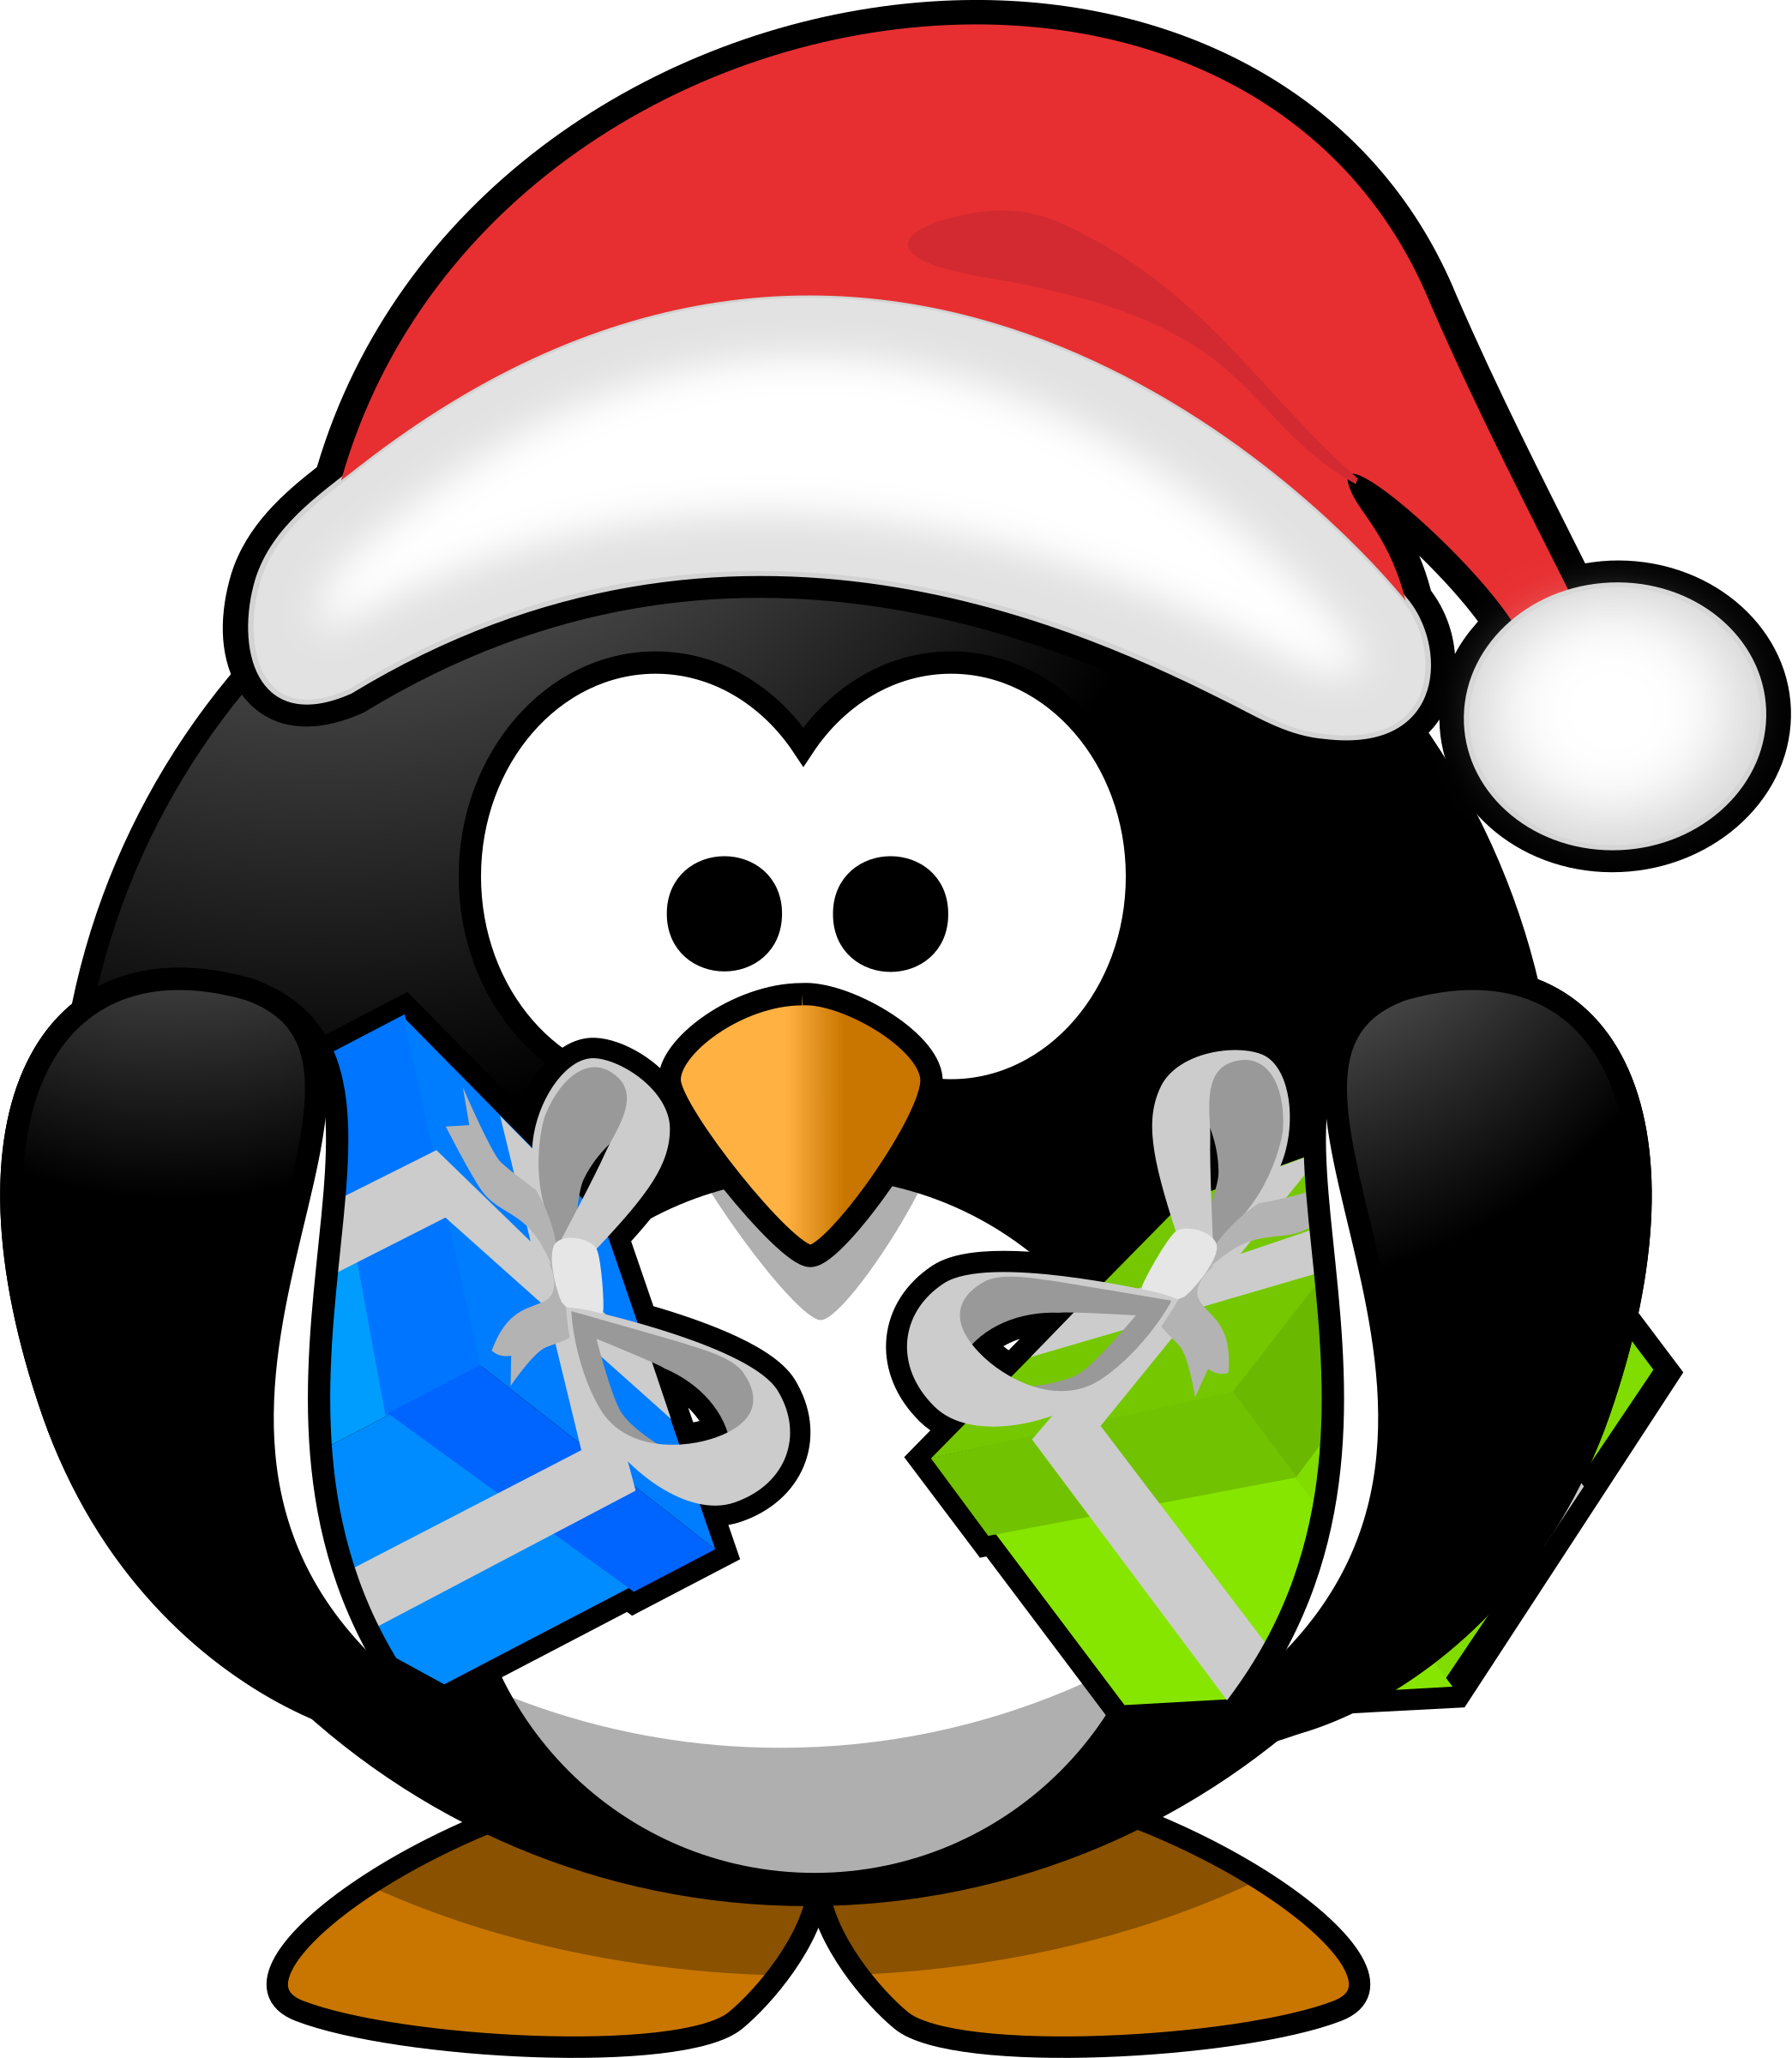 Christmas drawing at getdrawings. Mask clipart penguin